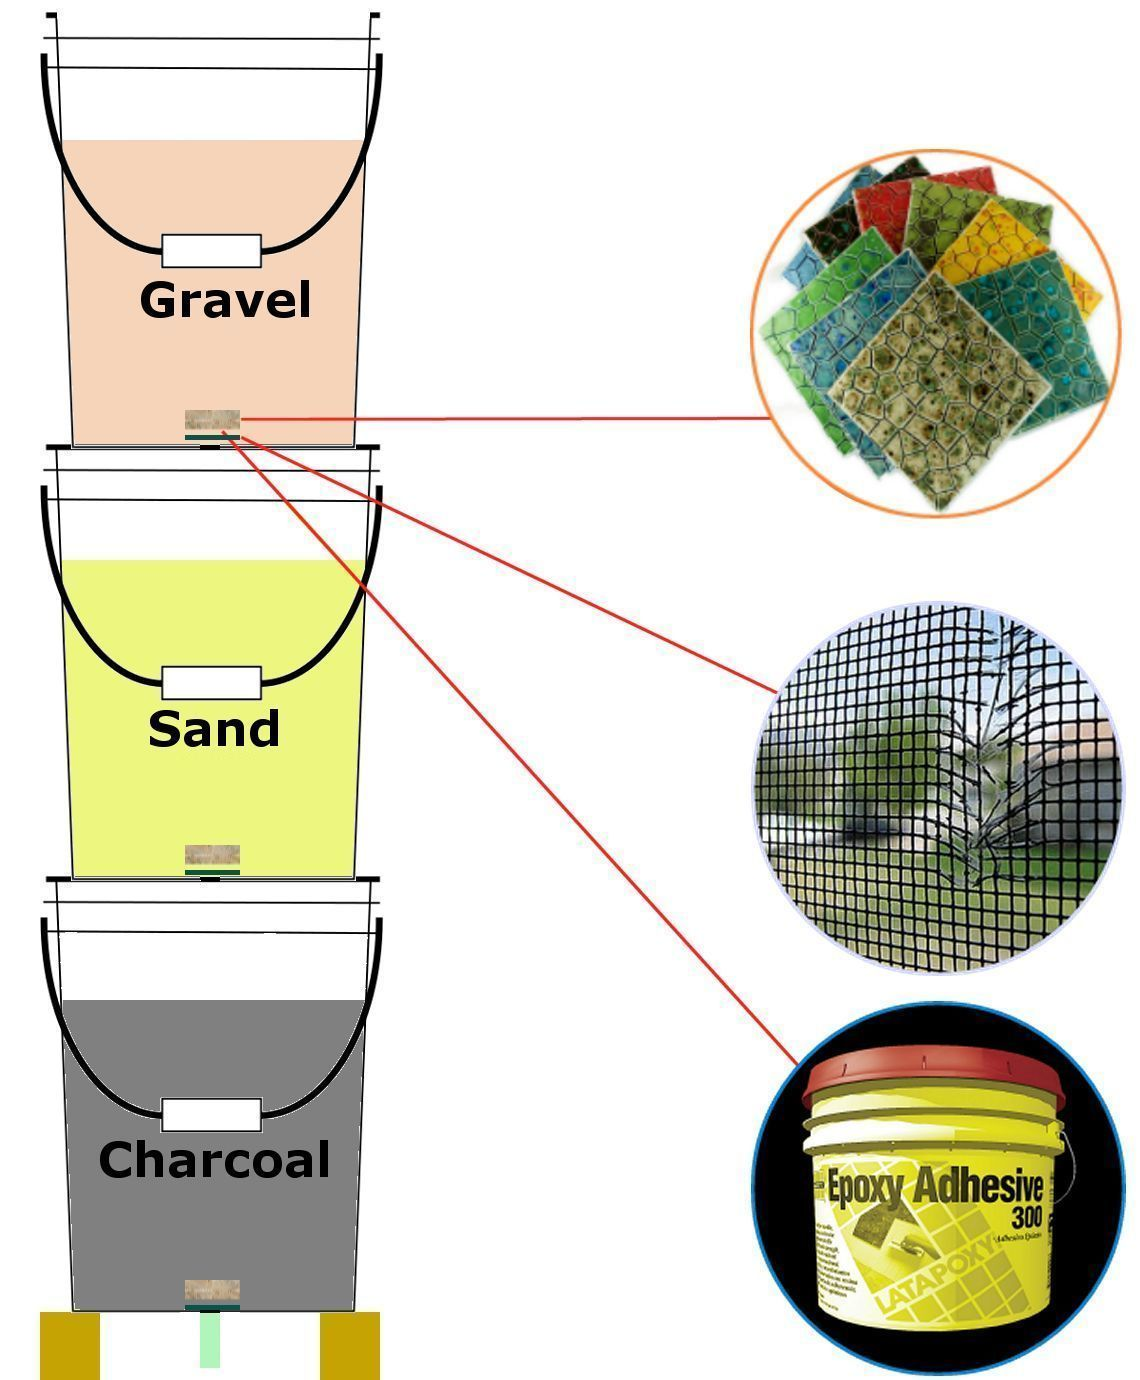 Bucket Diagram Water Filter Charcoal Gravel Sand Water Filter Diy Emergency Water Survival Skills